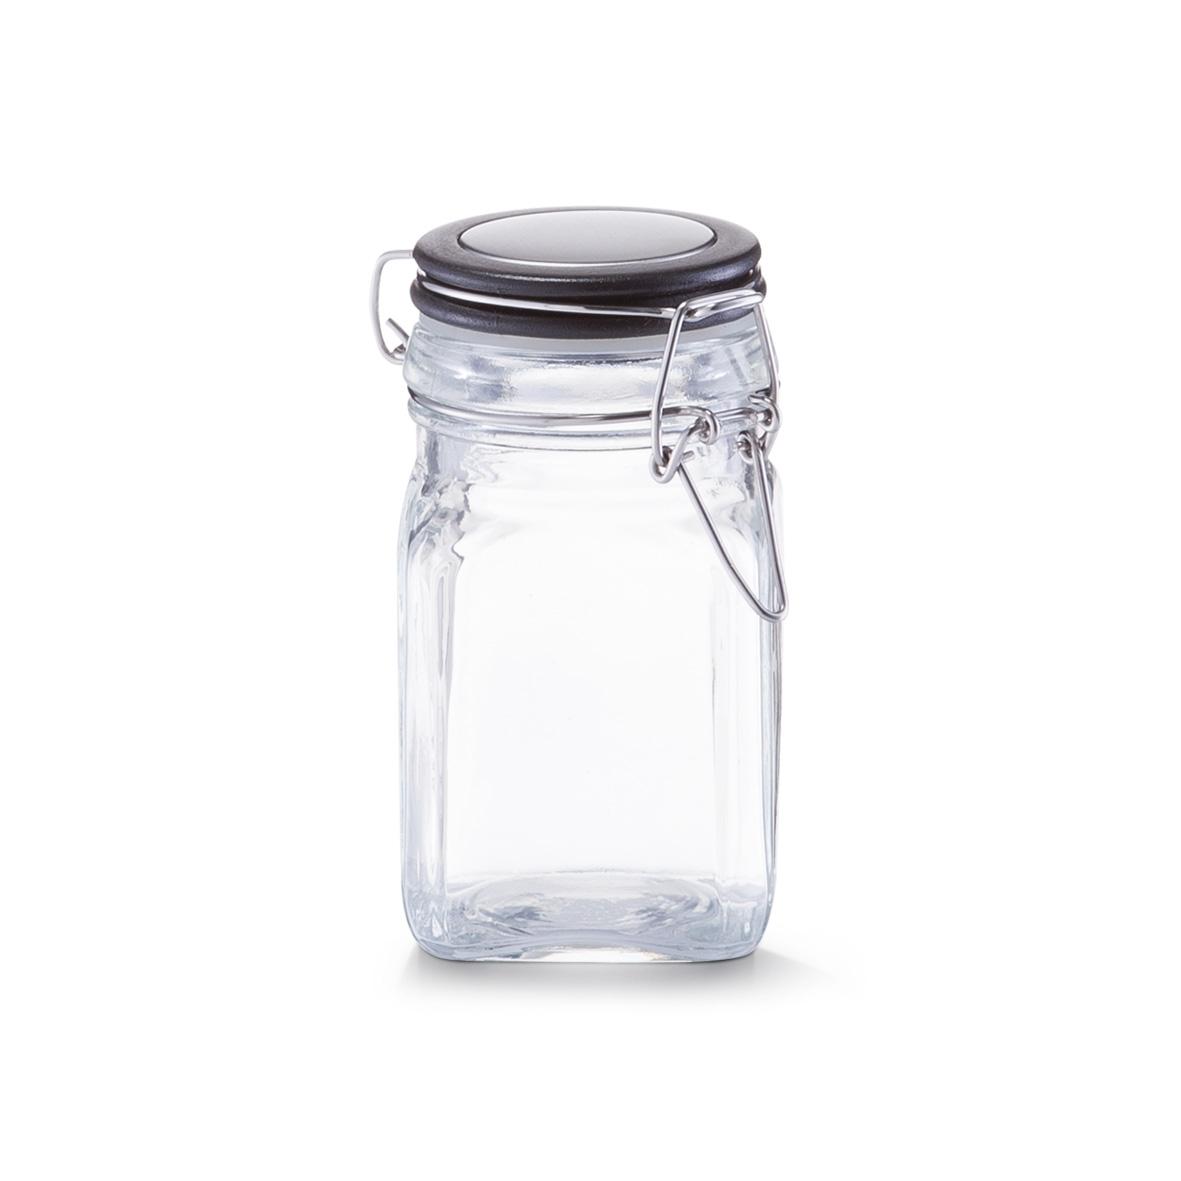 Borcan pentru depozitare cu capac, inchidere ermetica, 280 ml, l6,5xA6,5xH12 cm